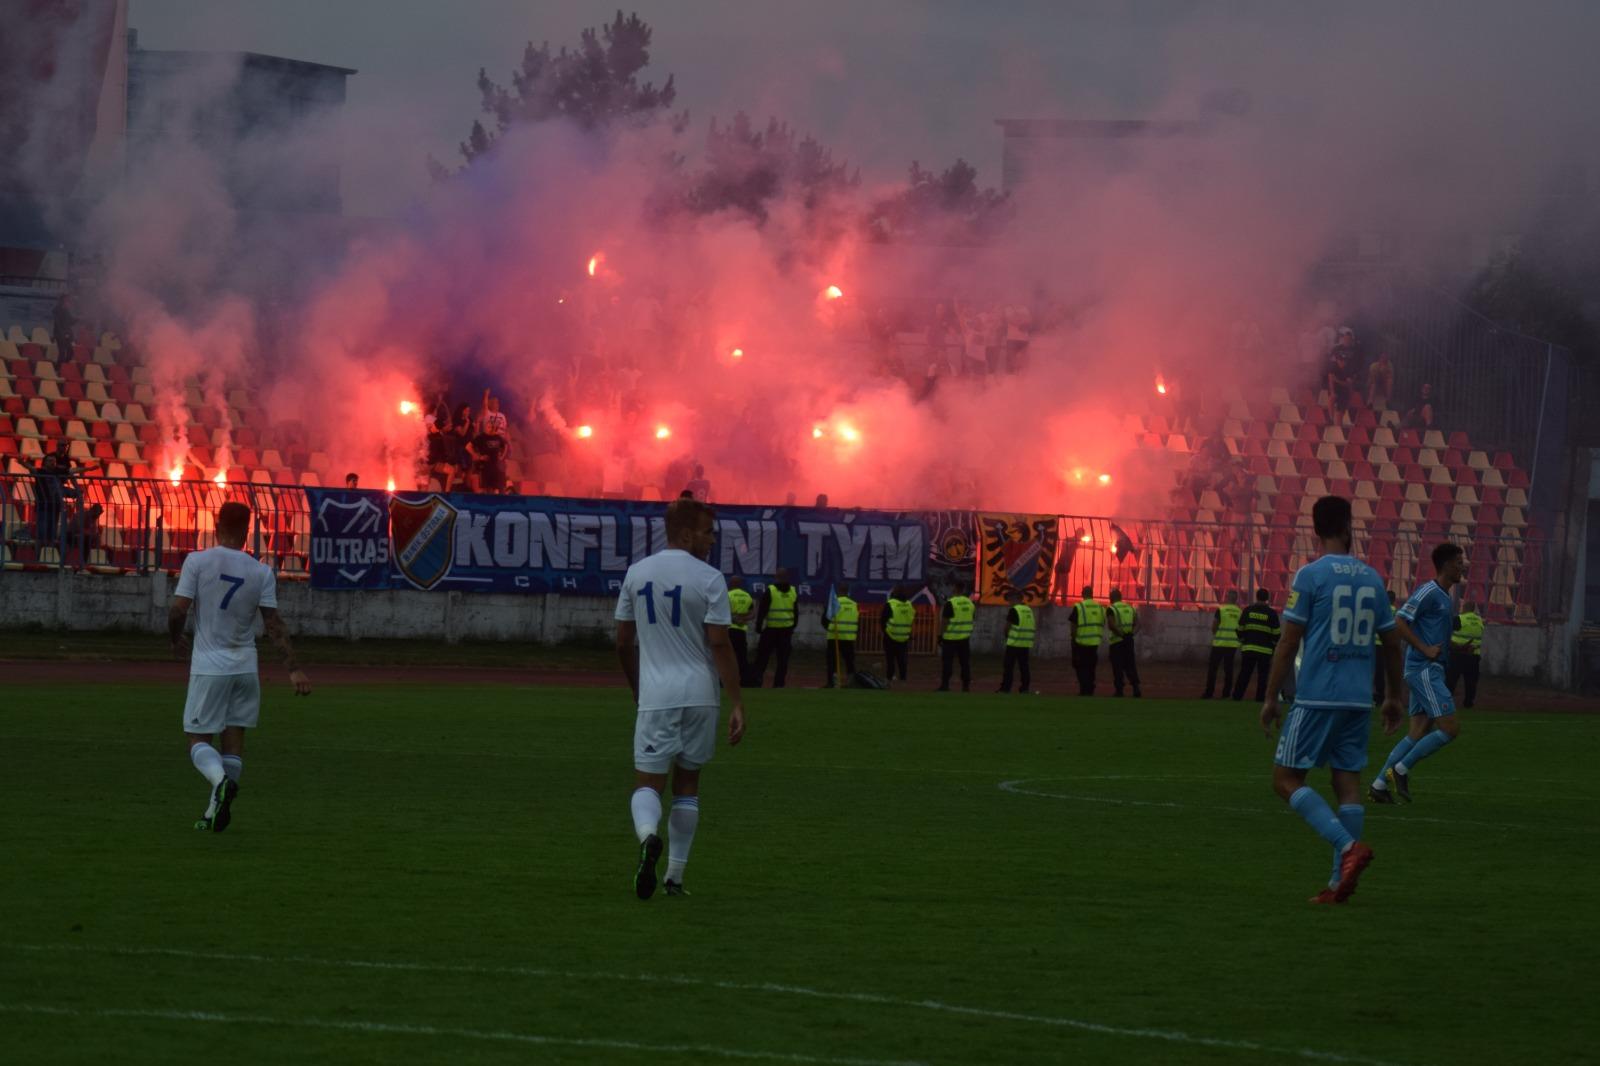 Slovan_bratislava_fcb_2019-2020.jpg (248 KB)